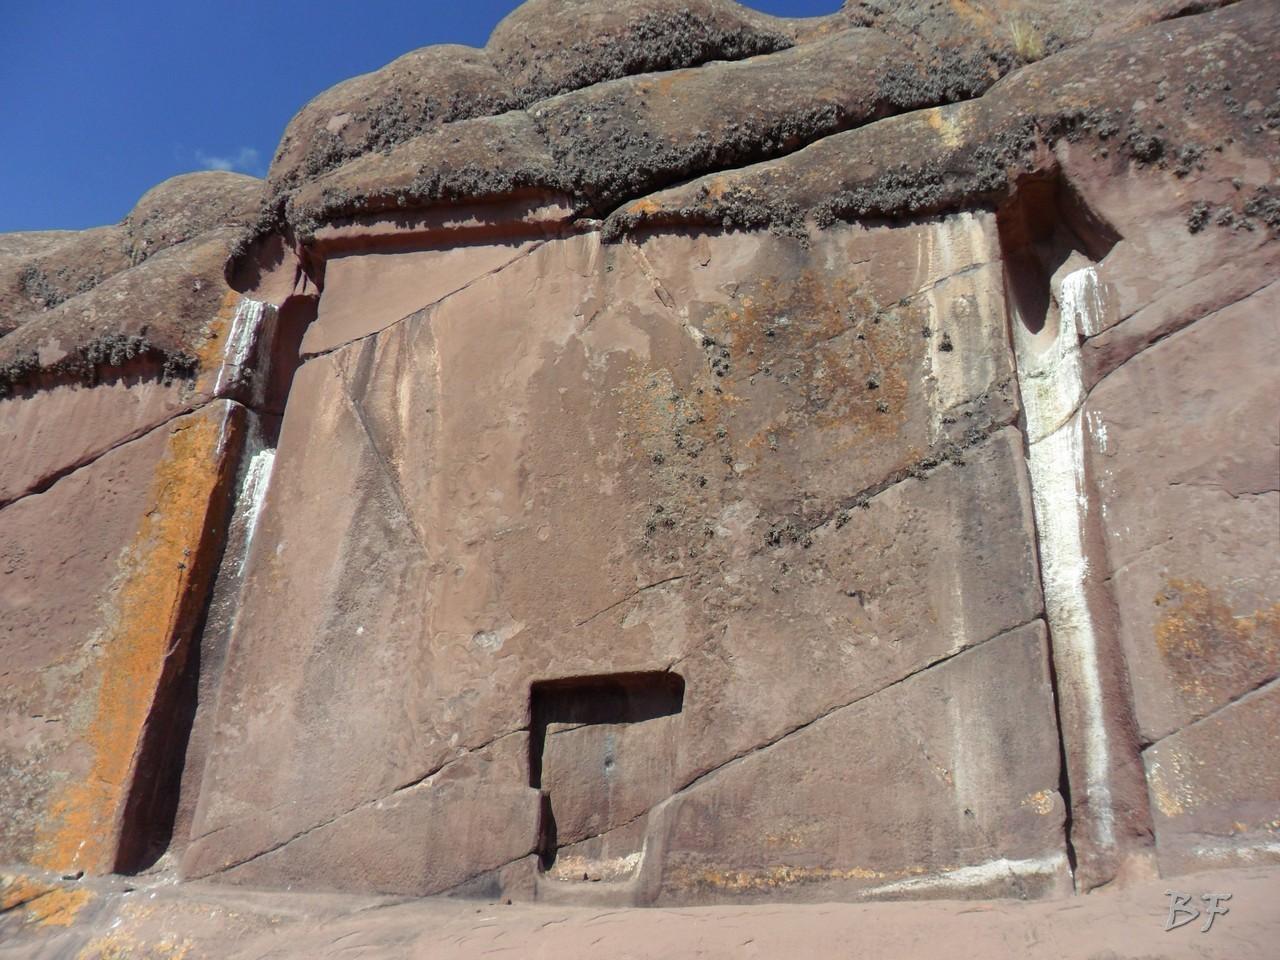 Edificio-Rupestre-Porta-Dimensionale-Megaliti-Aramu-Muru-Puno-Perù-6